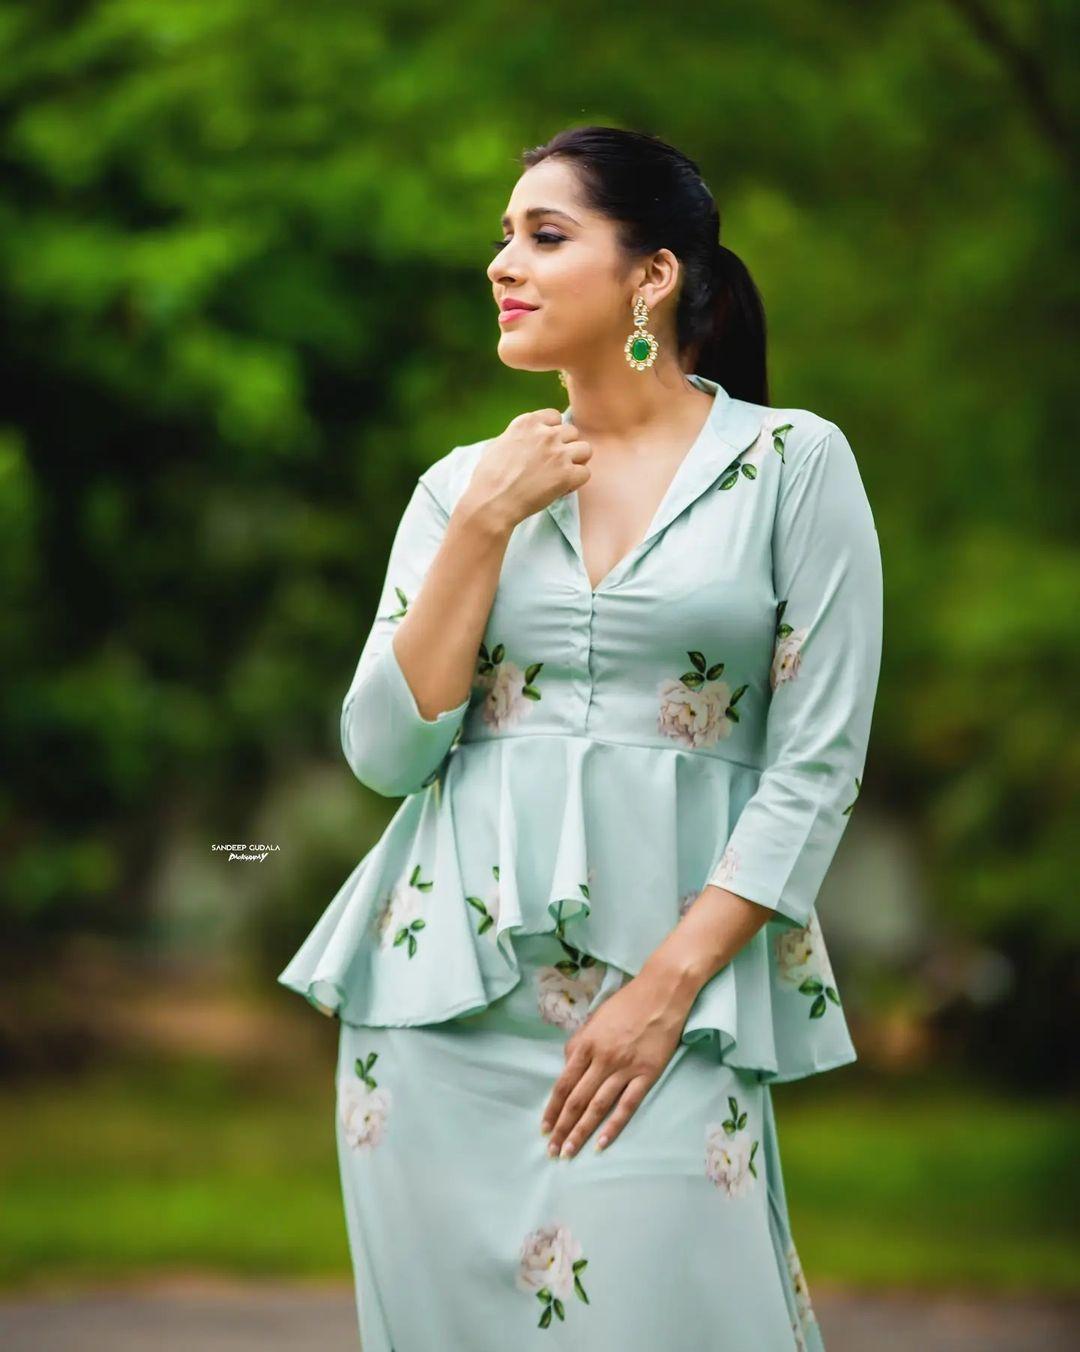 Beautiful actress Rahsmi Gautham in olive green color floral peplum top and bottom. 2021-07-17